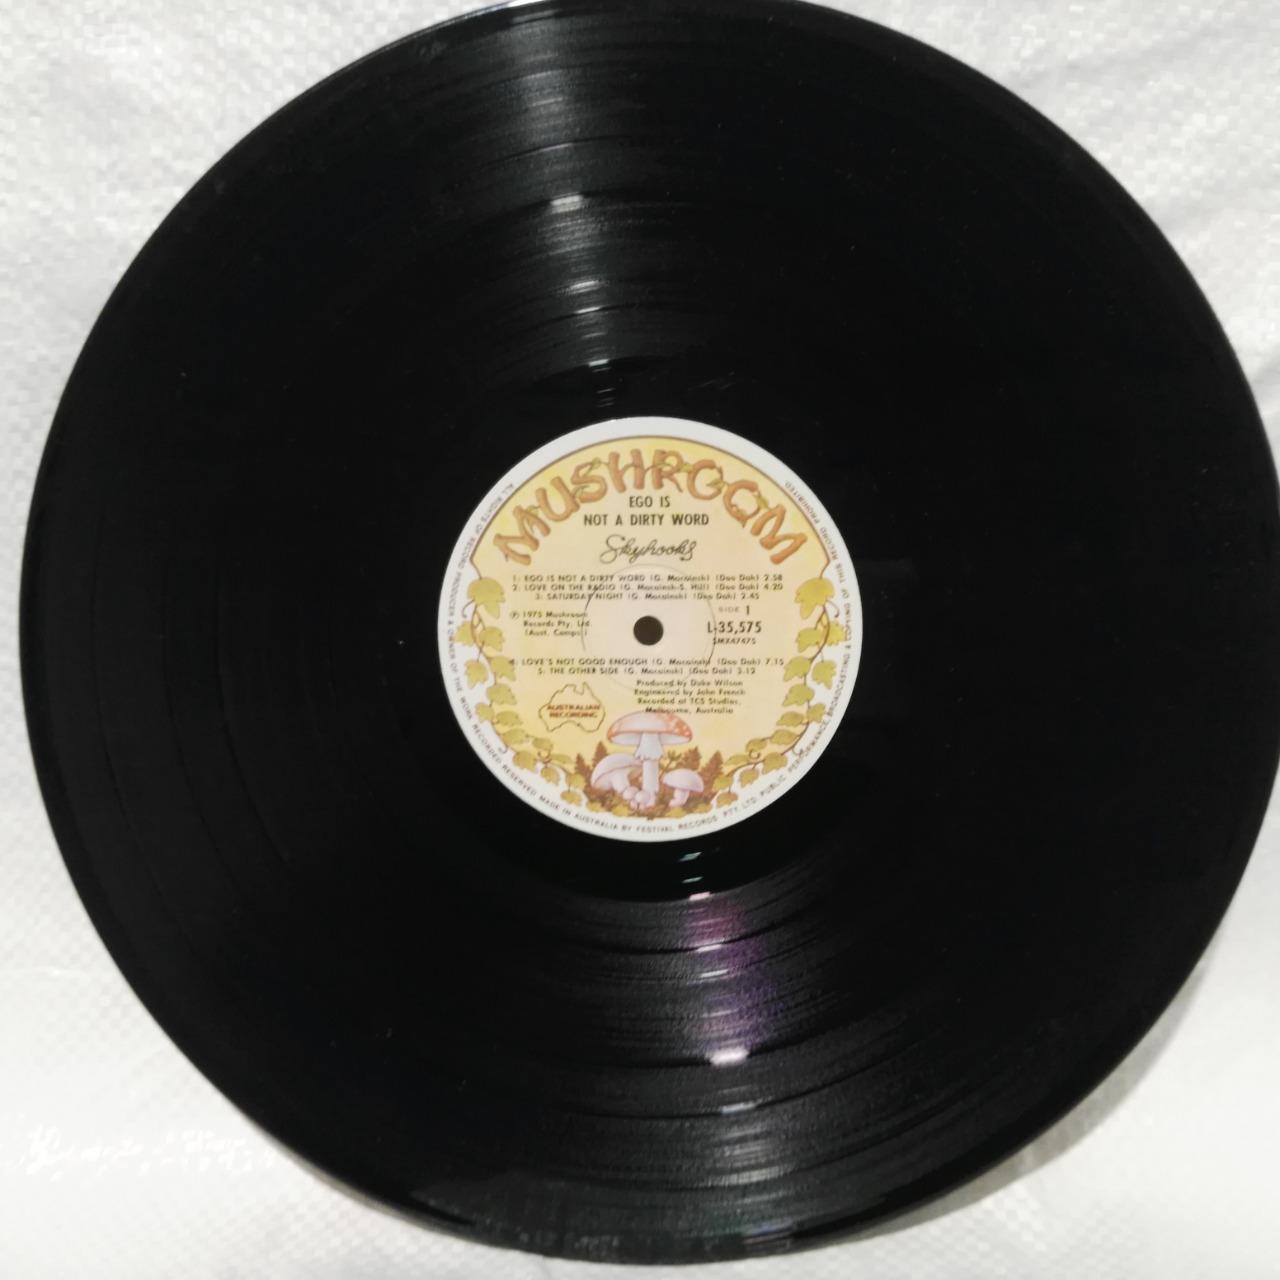 Vinyl Album Skyhooks - Ego I Not A Dirty Word